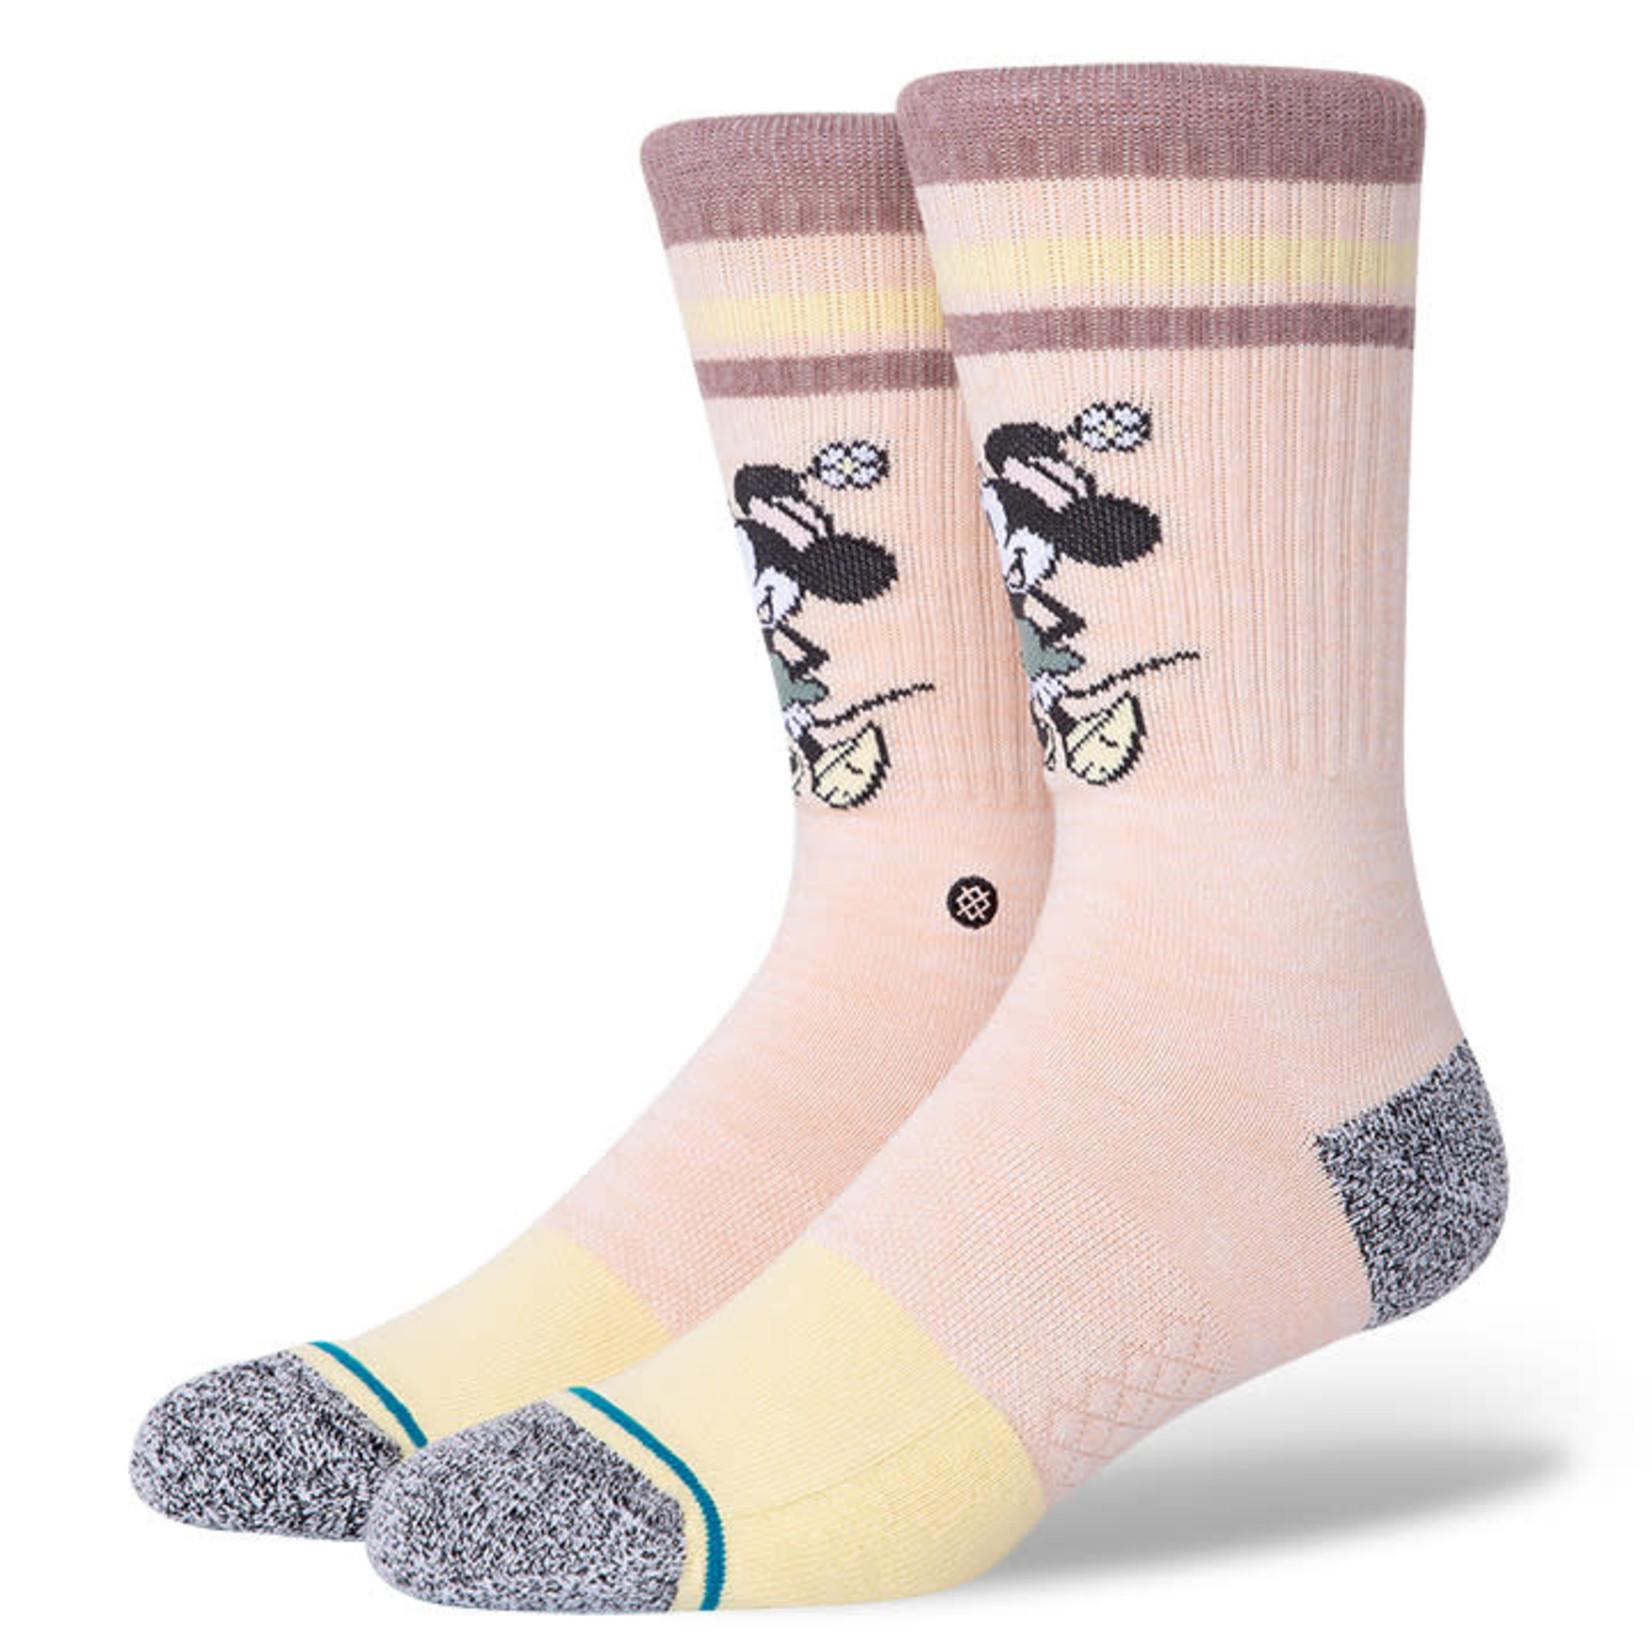 Stance Stance Womens Sock Vintage Minnie 2020 M (8-10.5)